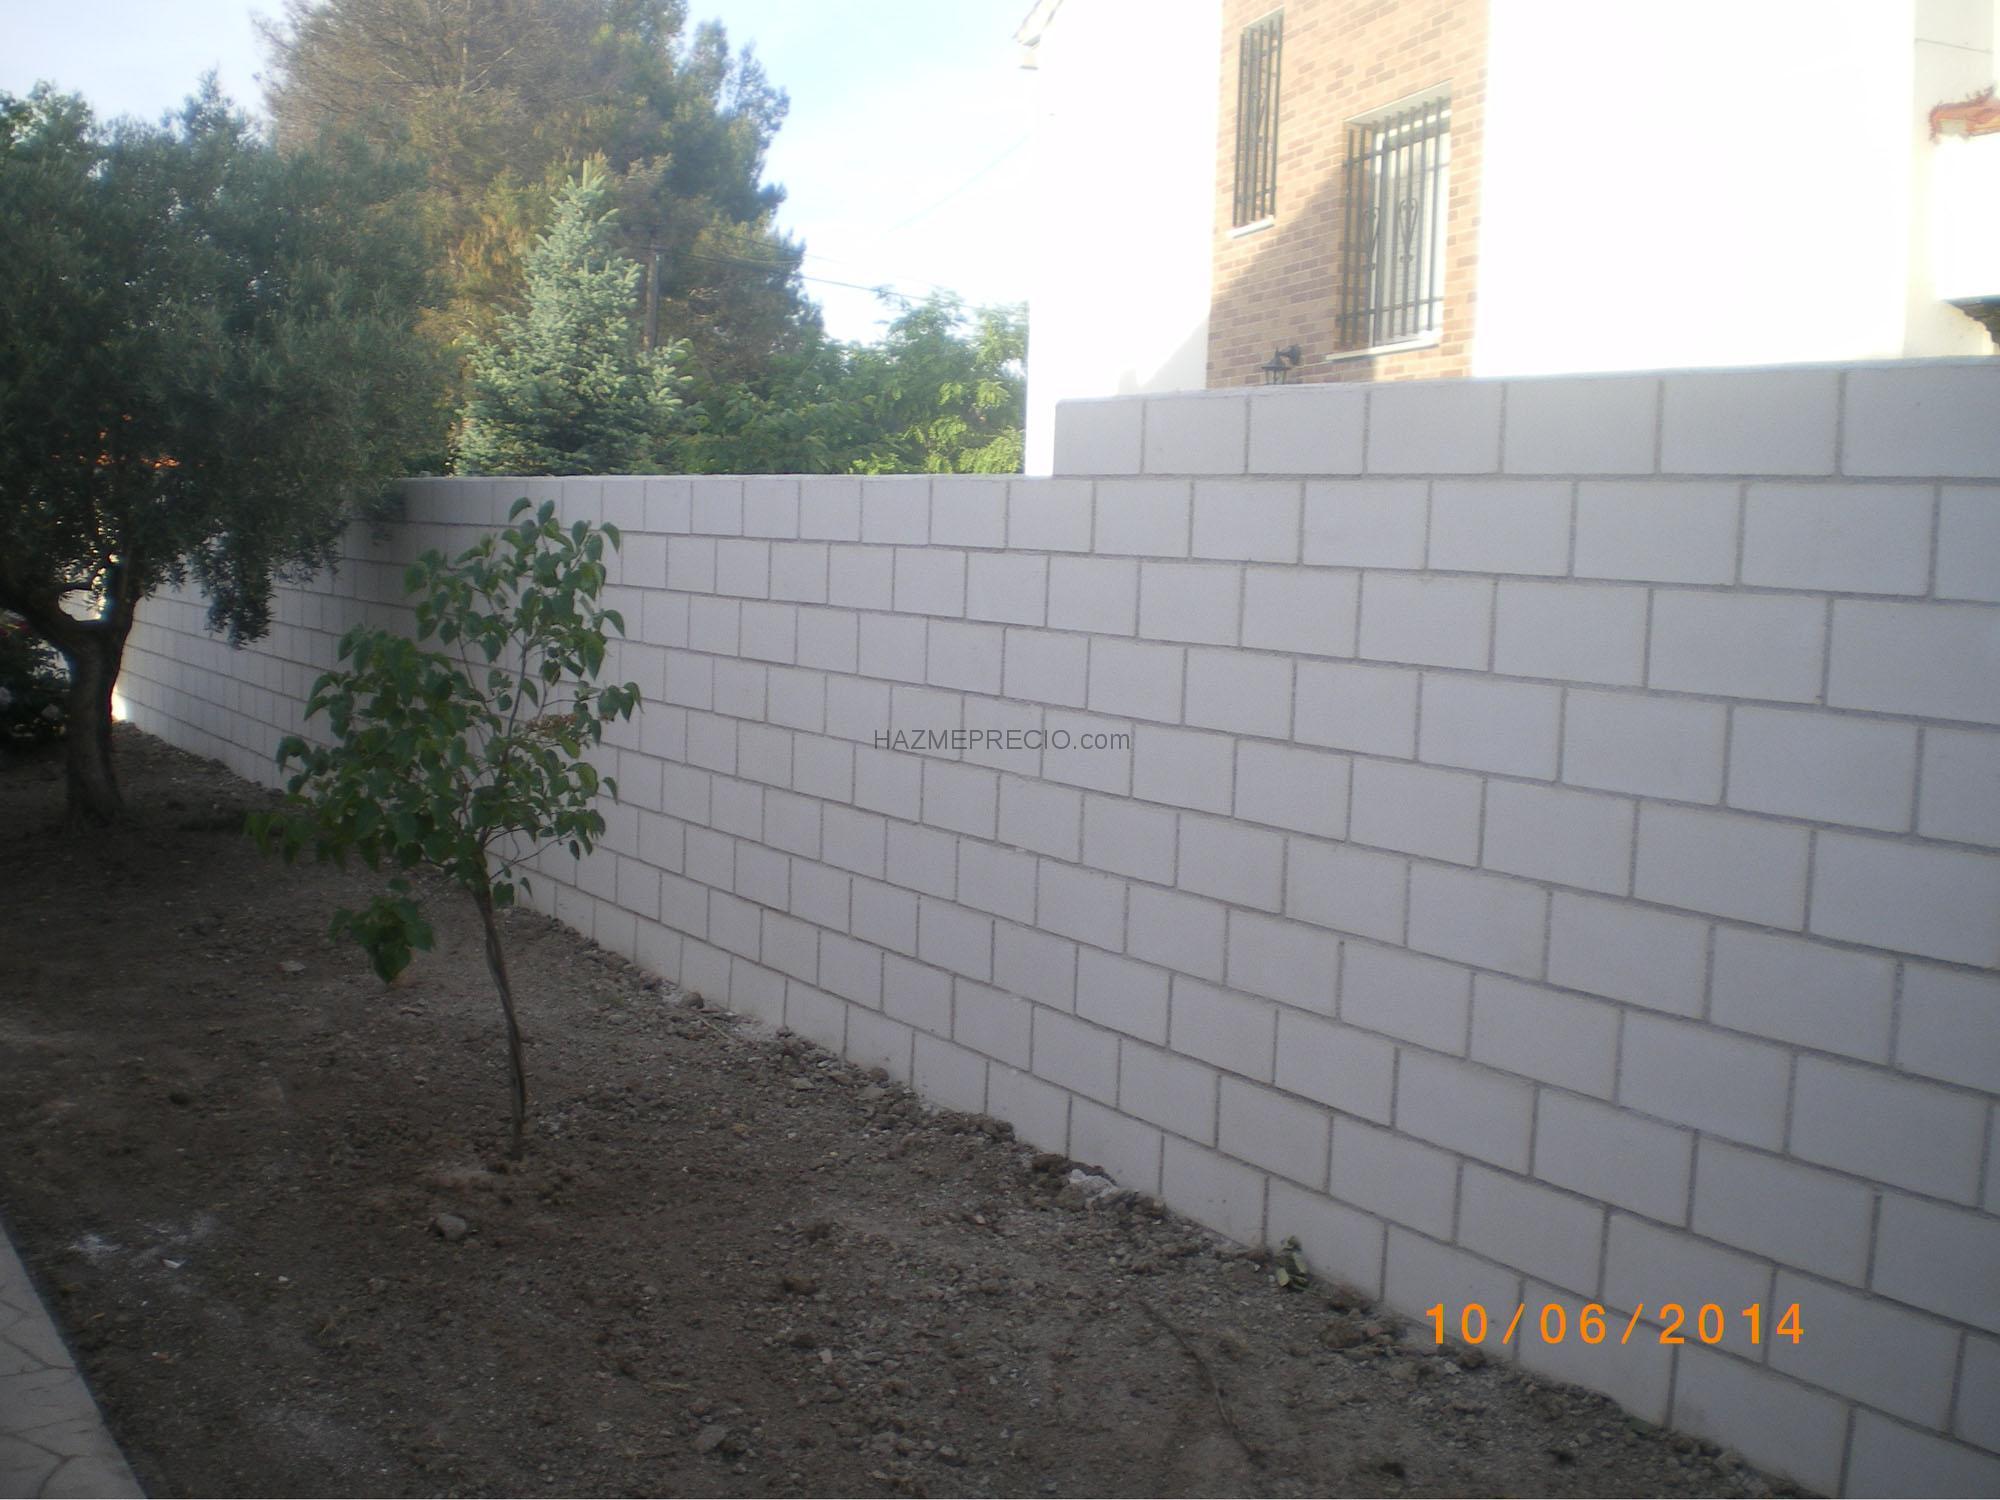 Construccion de muro con bloques de hormigon 98m2 alcal - Muro de bloques ...